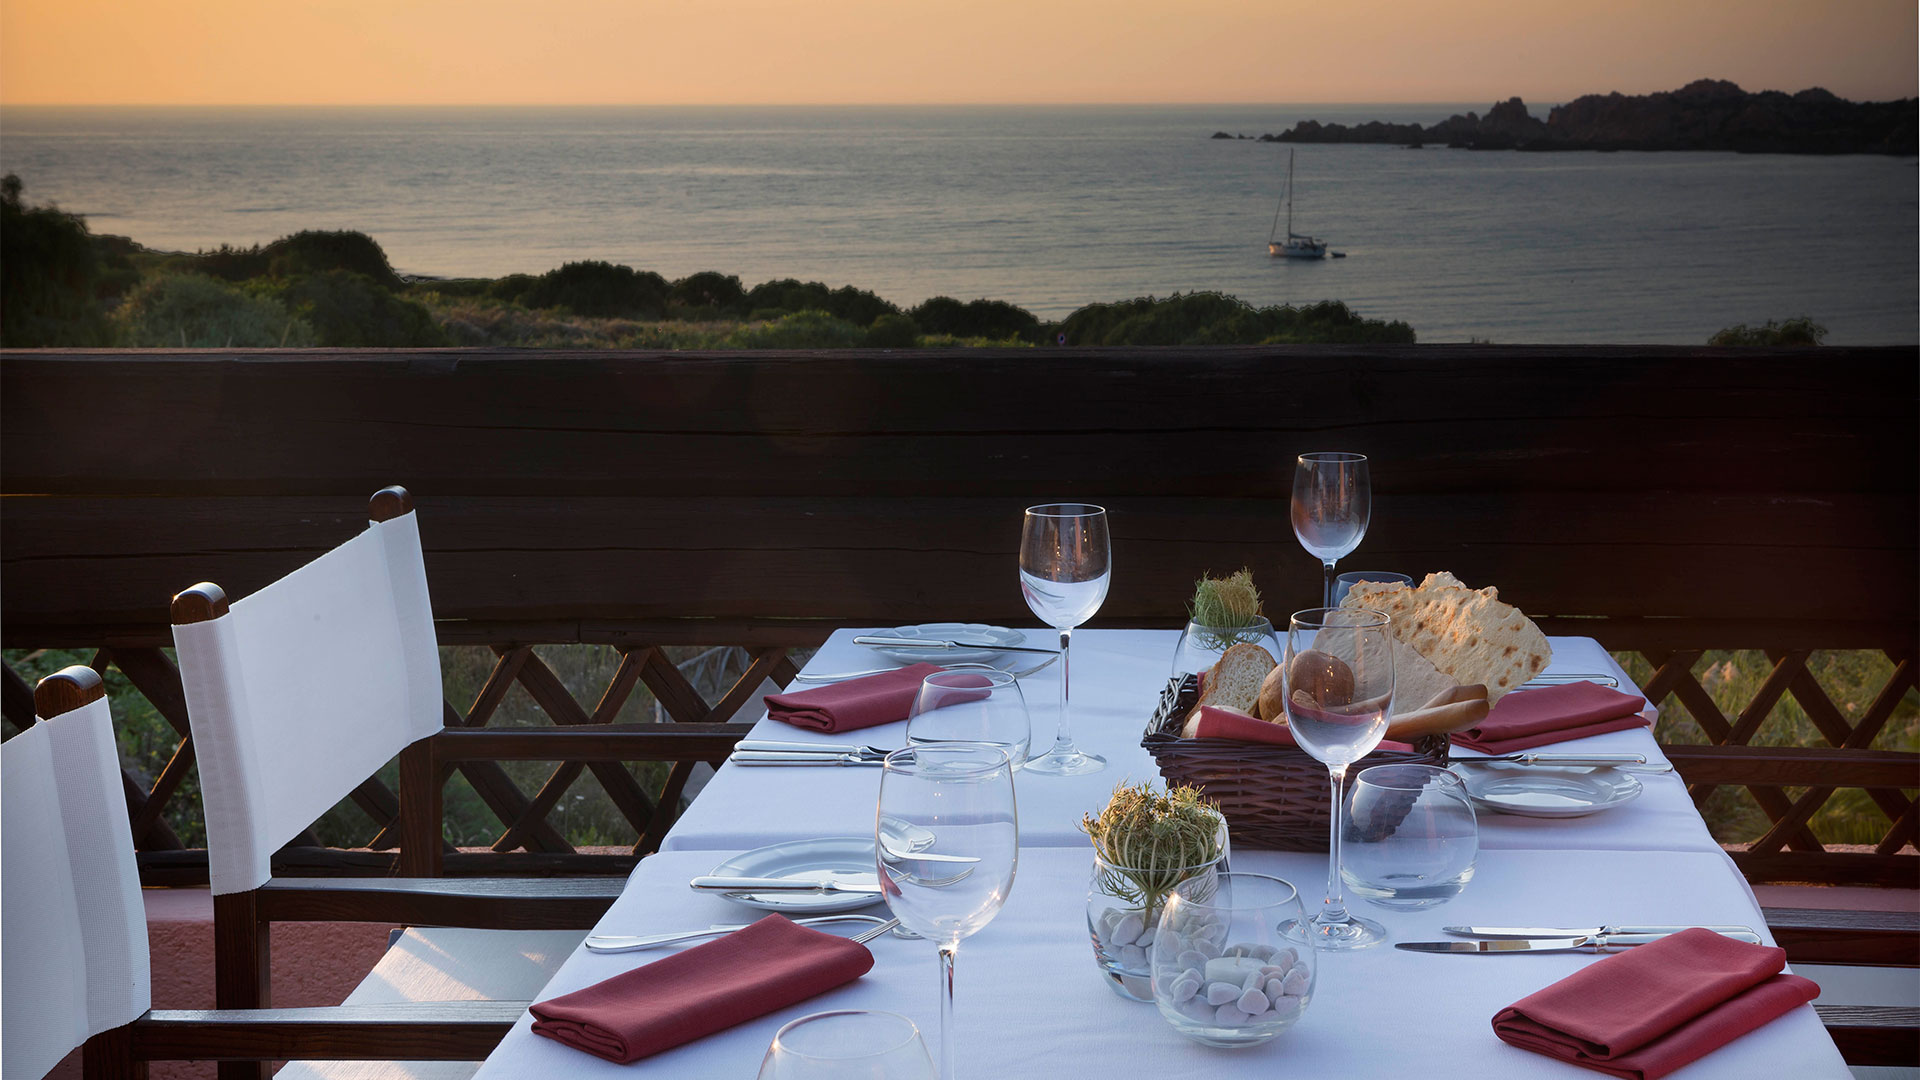 hotel-marinedda-slider-ristoranti-sardegna-mare-isola-rossa-5